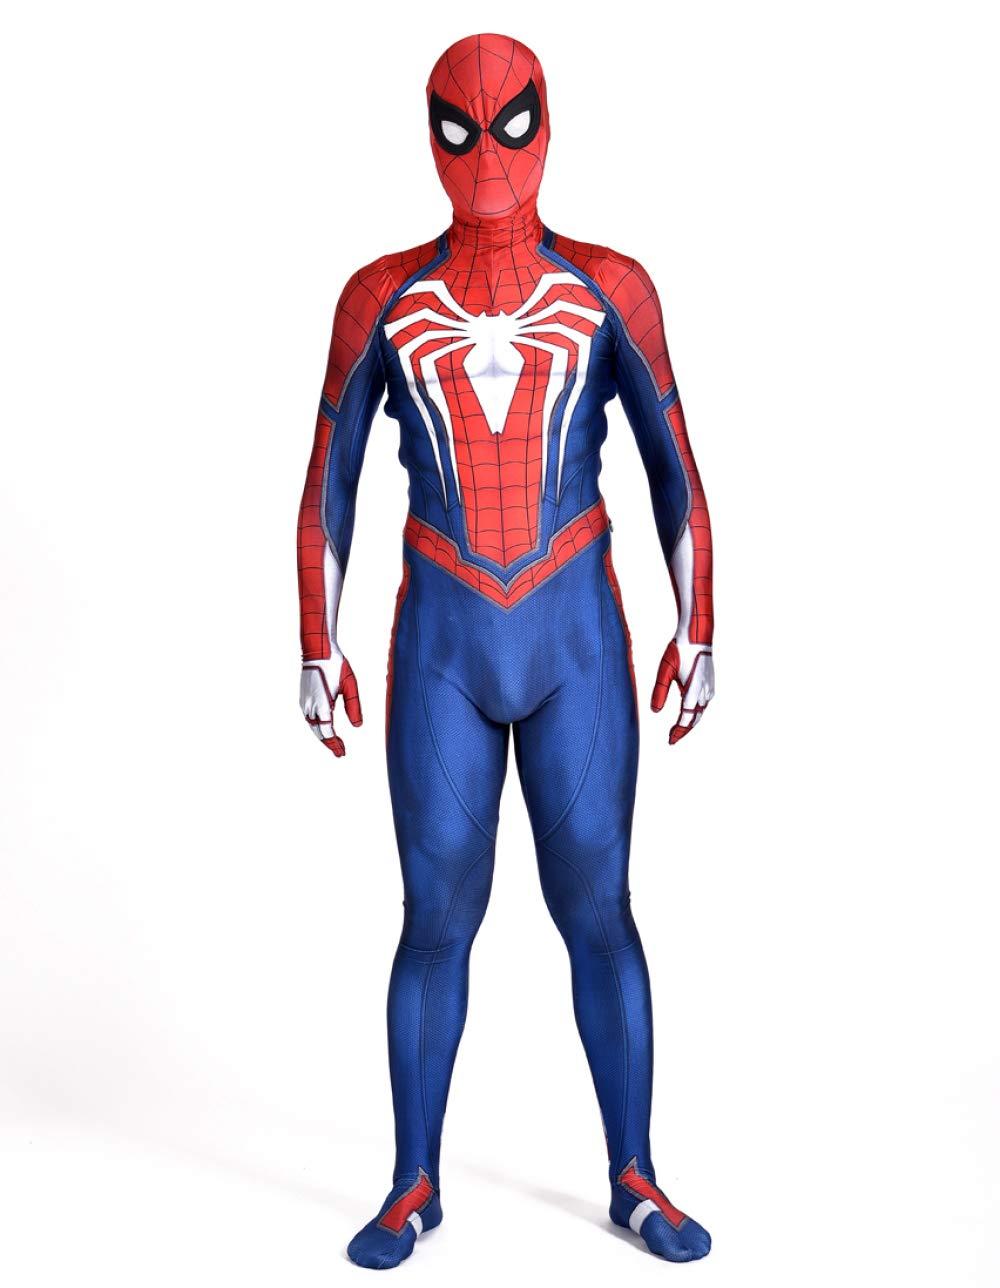 Amazon.com: DSFGHE Children Spiderman Cosplay Costume ...